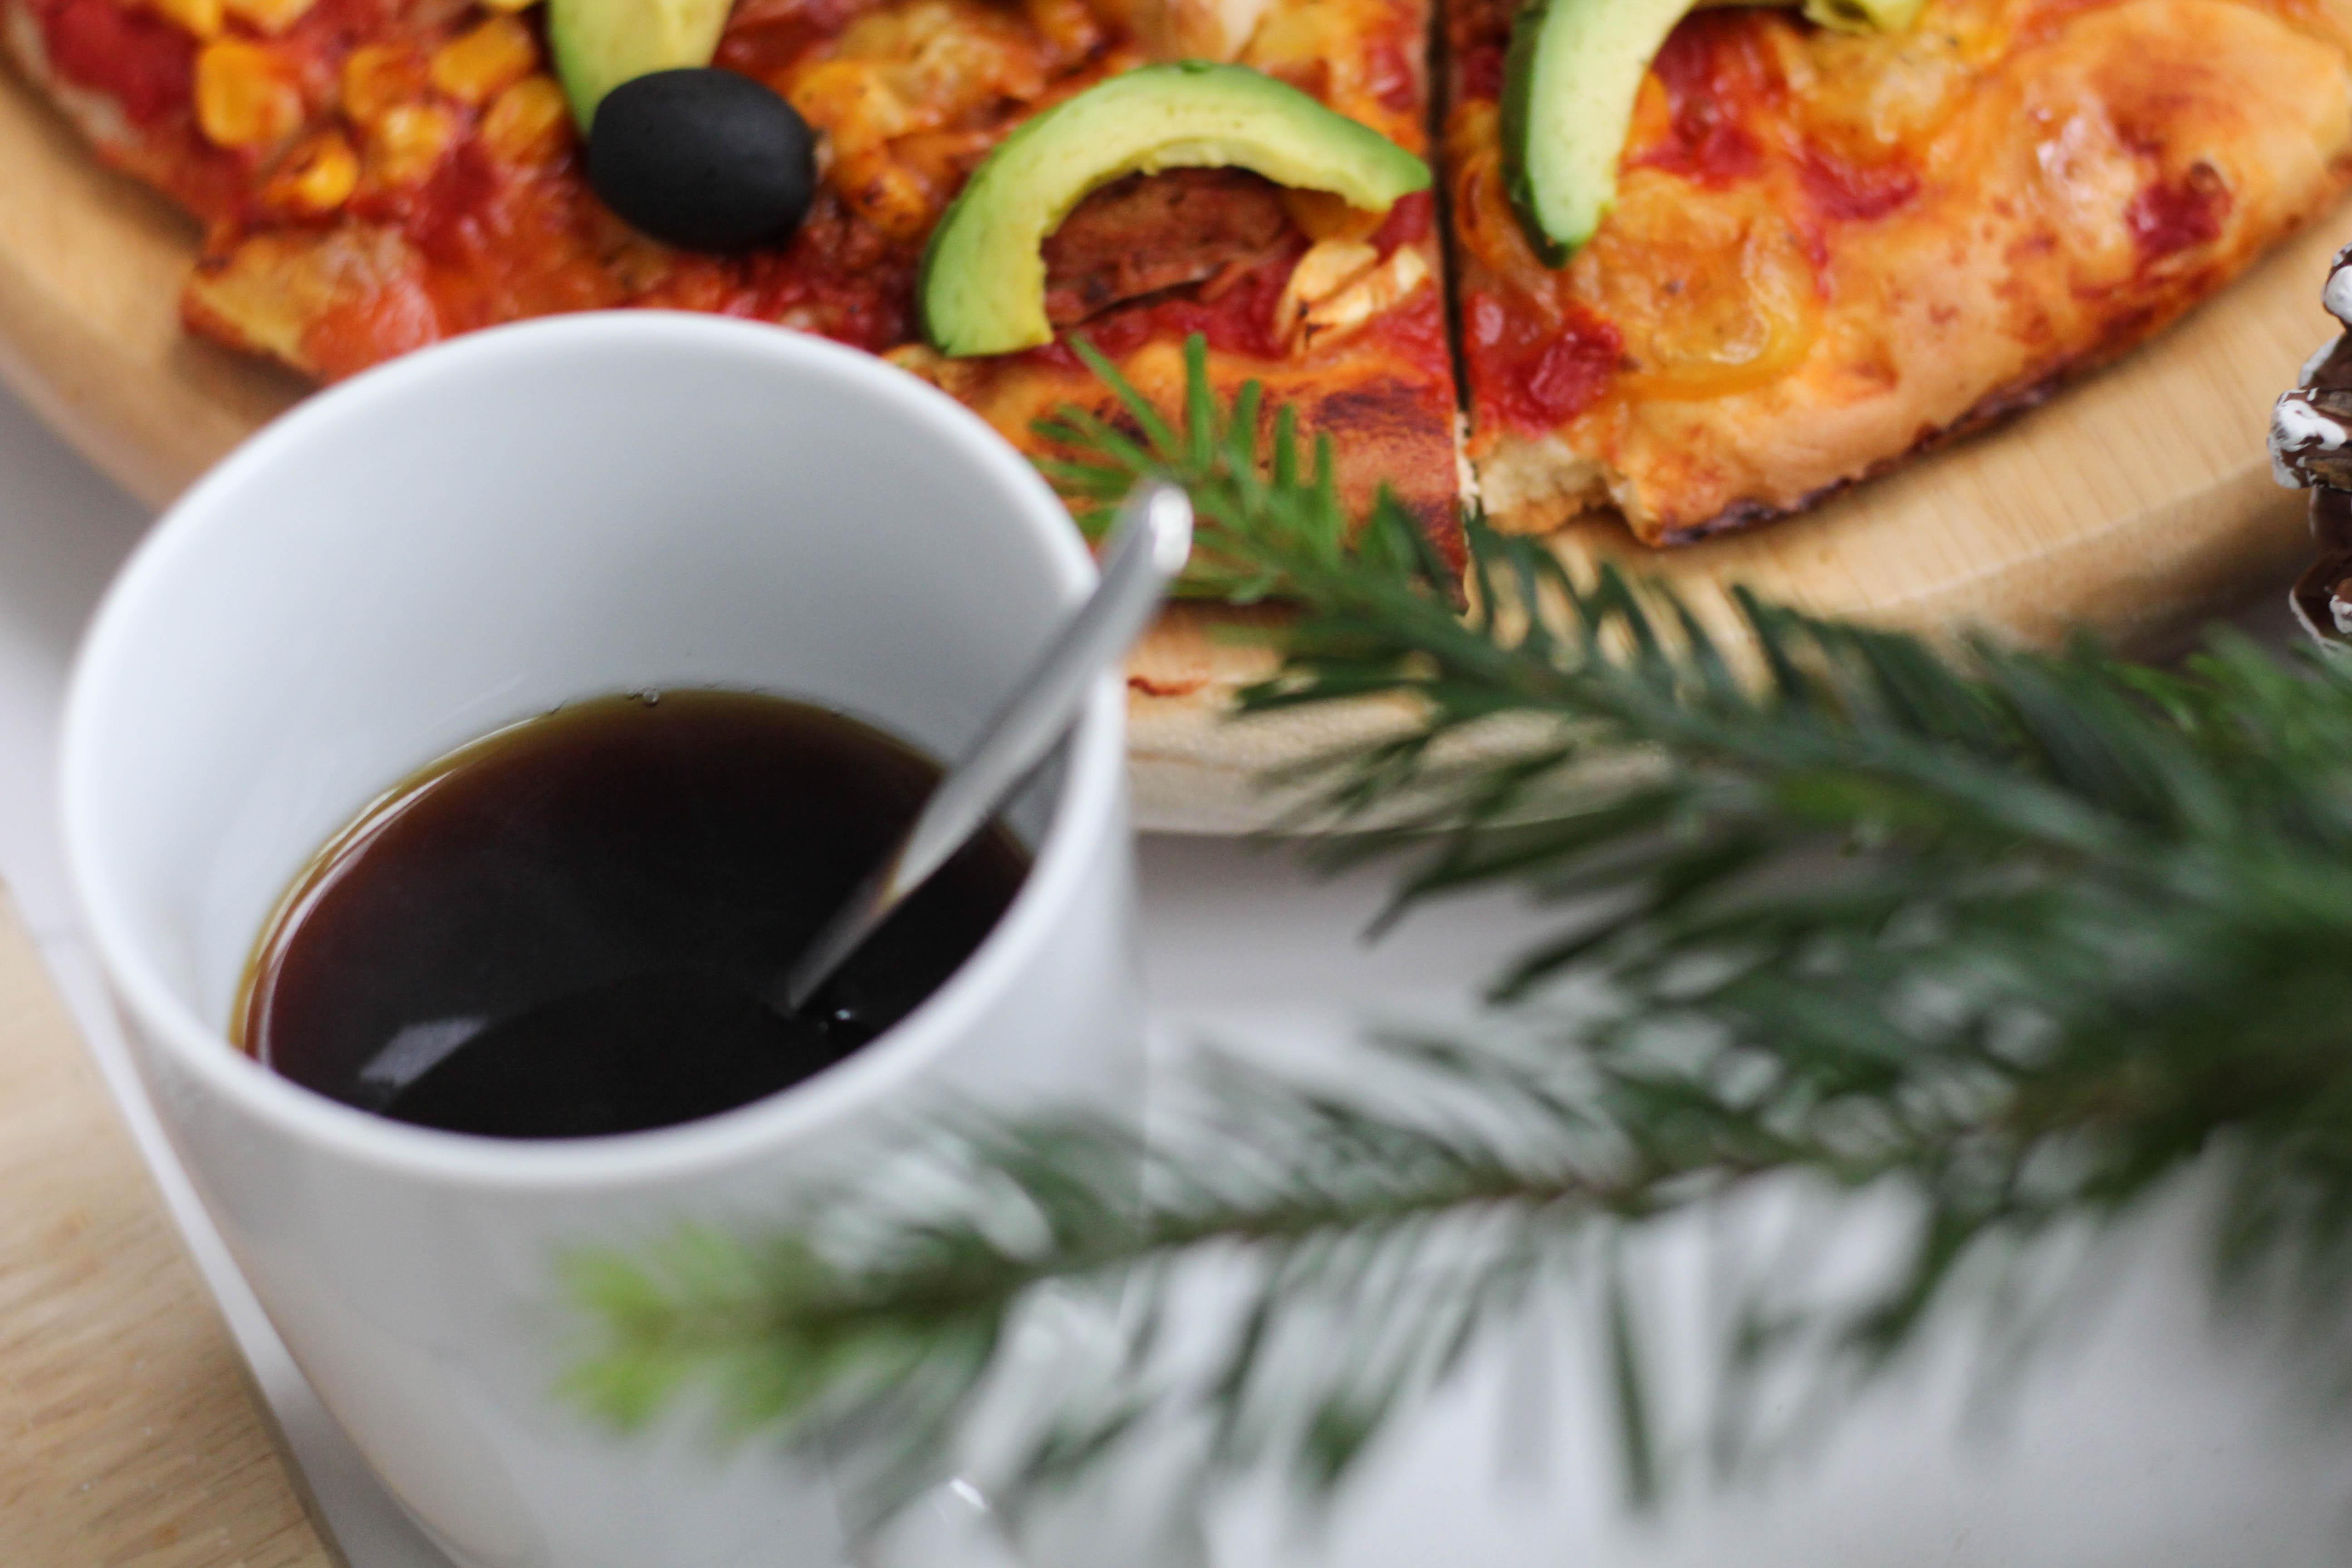 vegane pizza germteig gilmore girls homespa plantbased 1 von 1 2 dein homespa. Black Bedroom Furniture Sets. Home Design Ideas